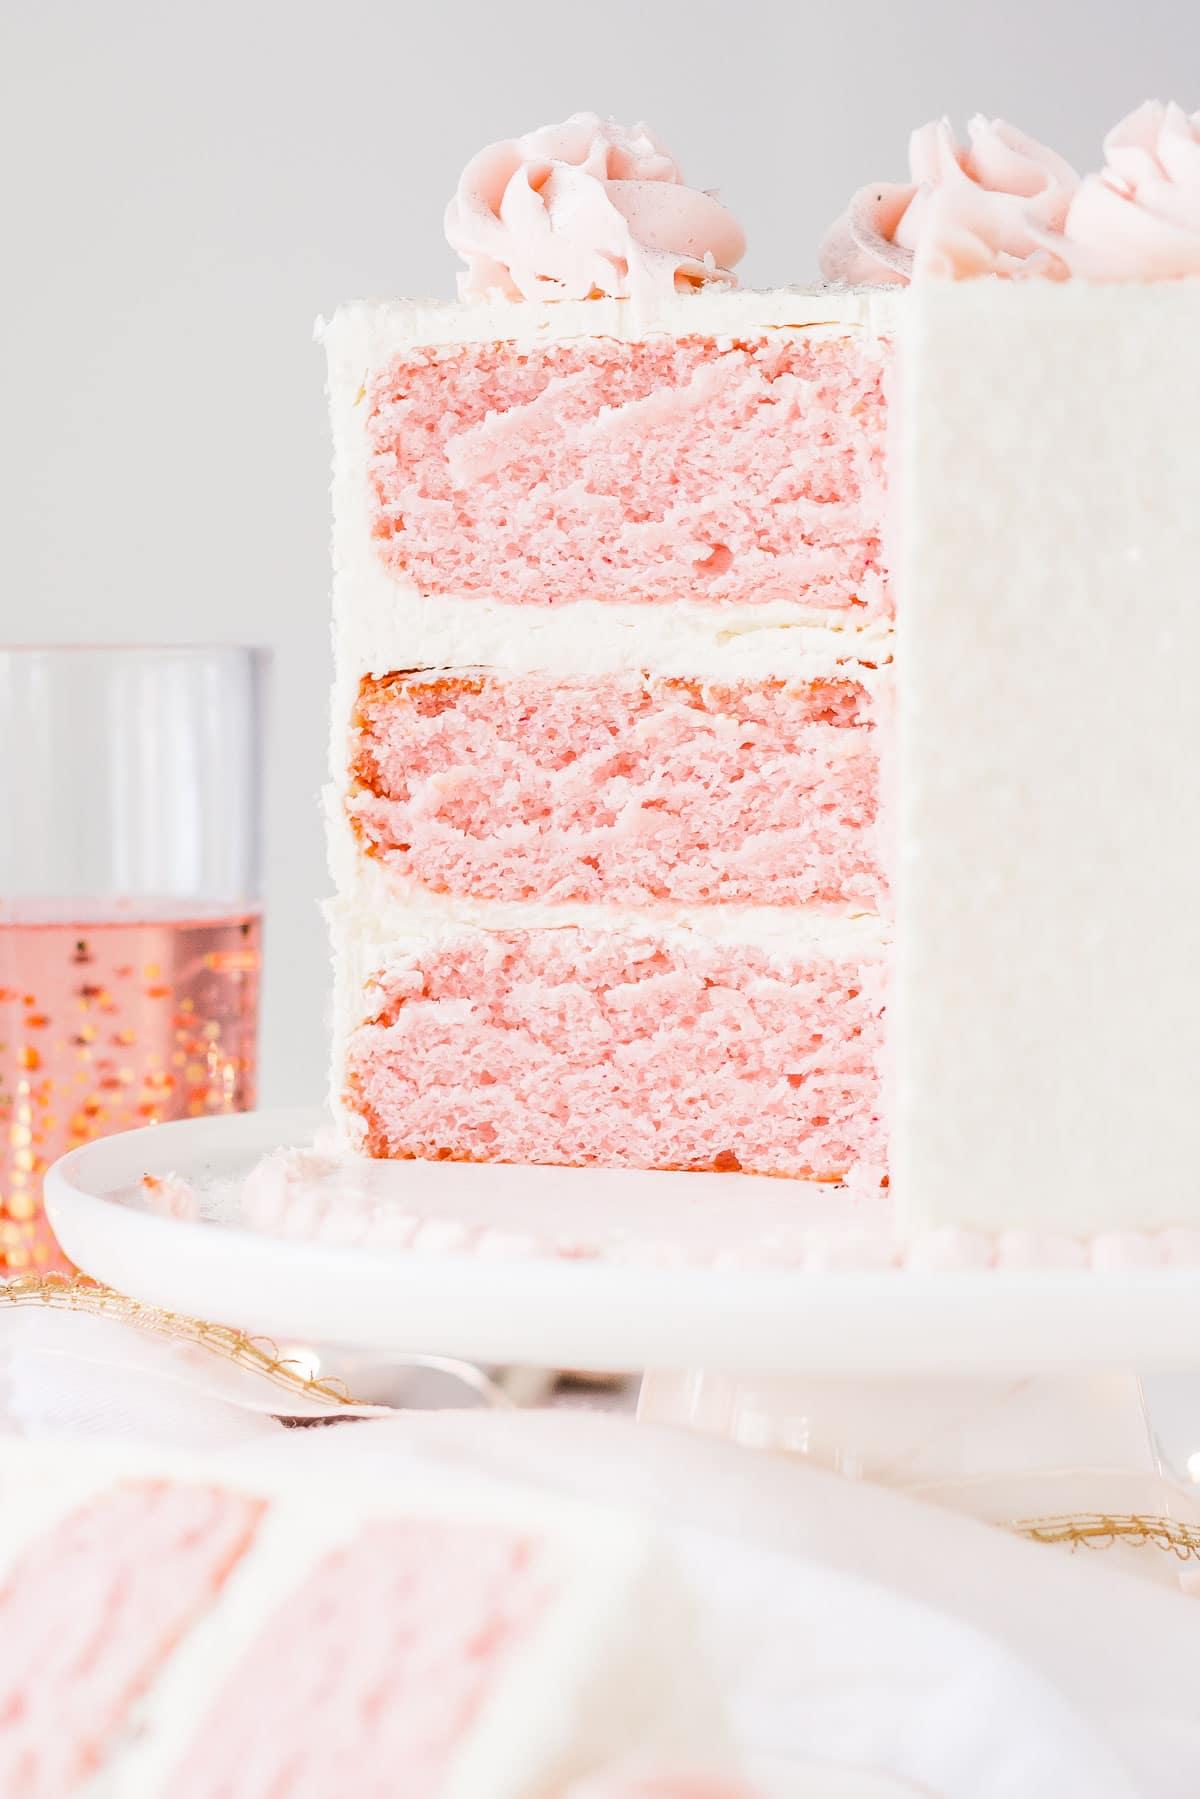 Cute Valentine's Day Cake: Pink Champagne Cake